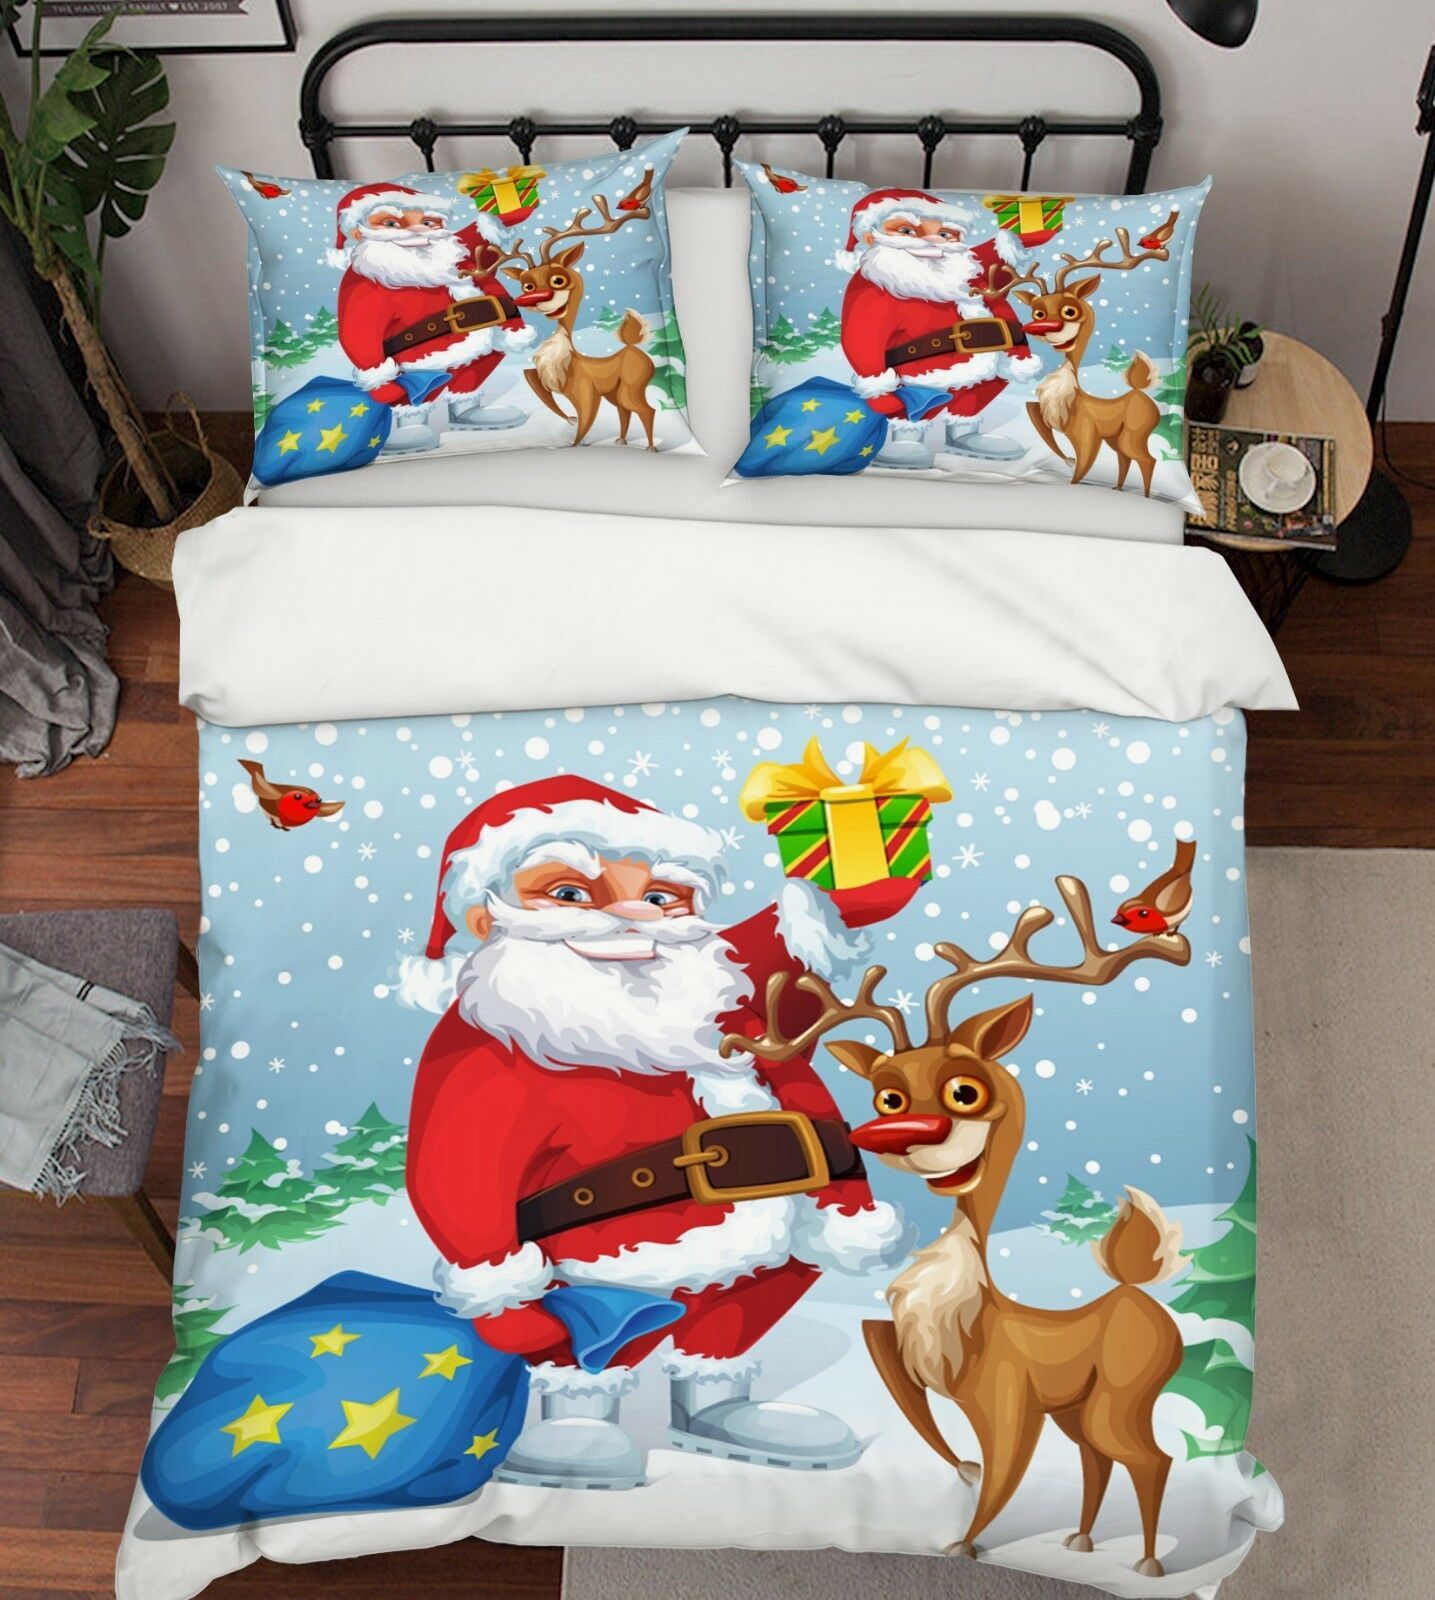 3D Christmas Xmas Paint 71 Bed Pillowcases Quilt Duvet Cover Set Single Queen UK